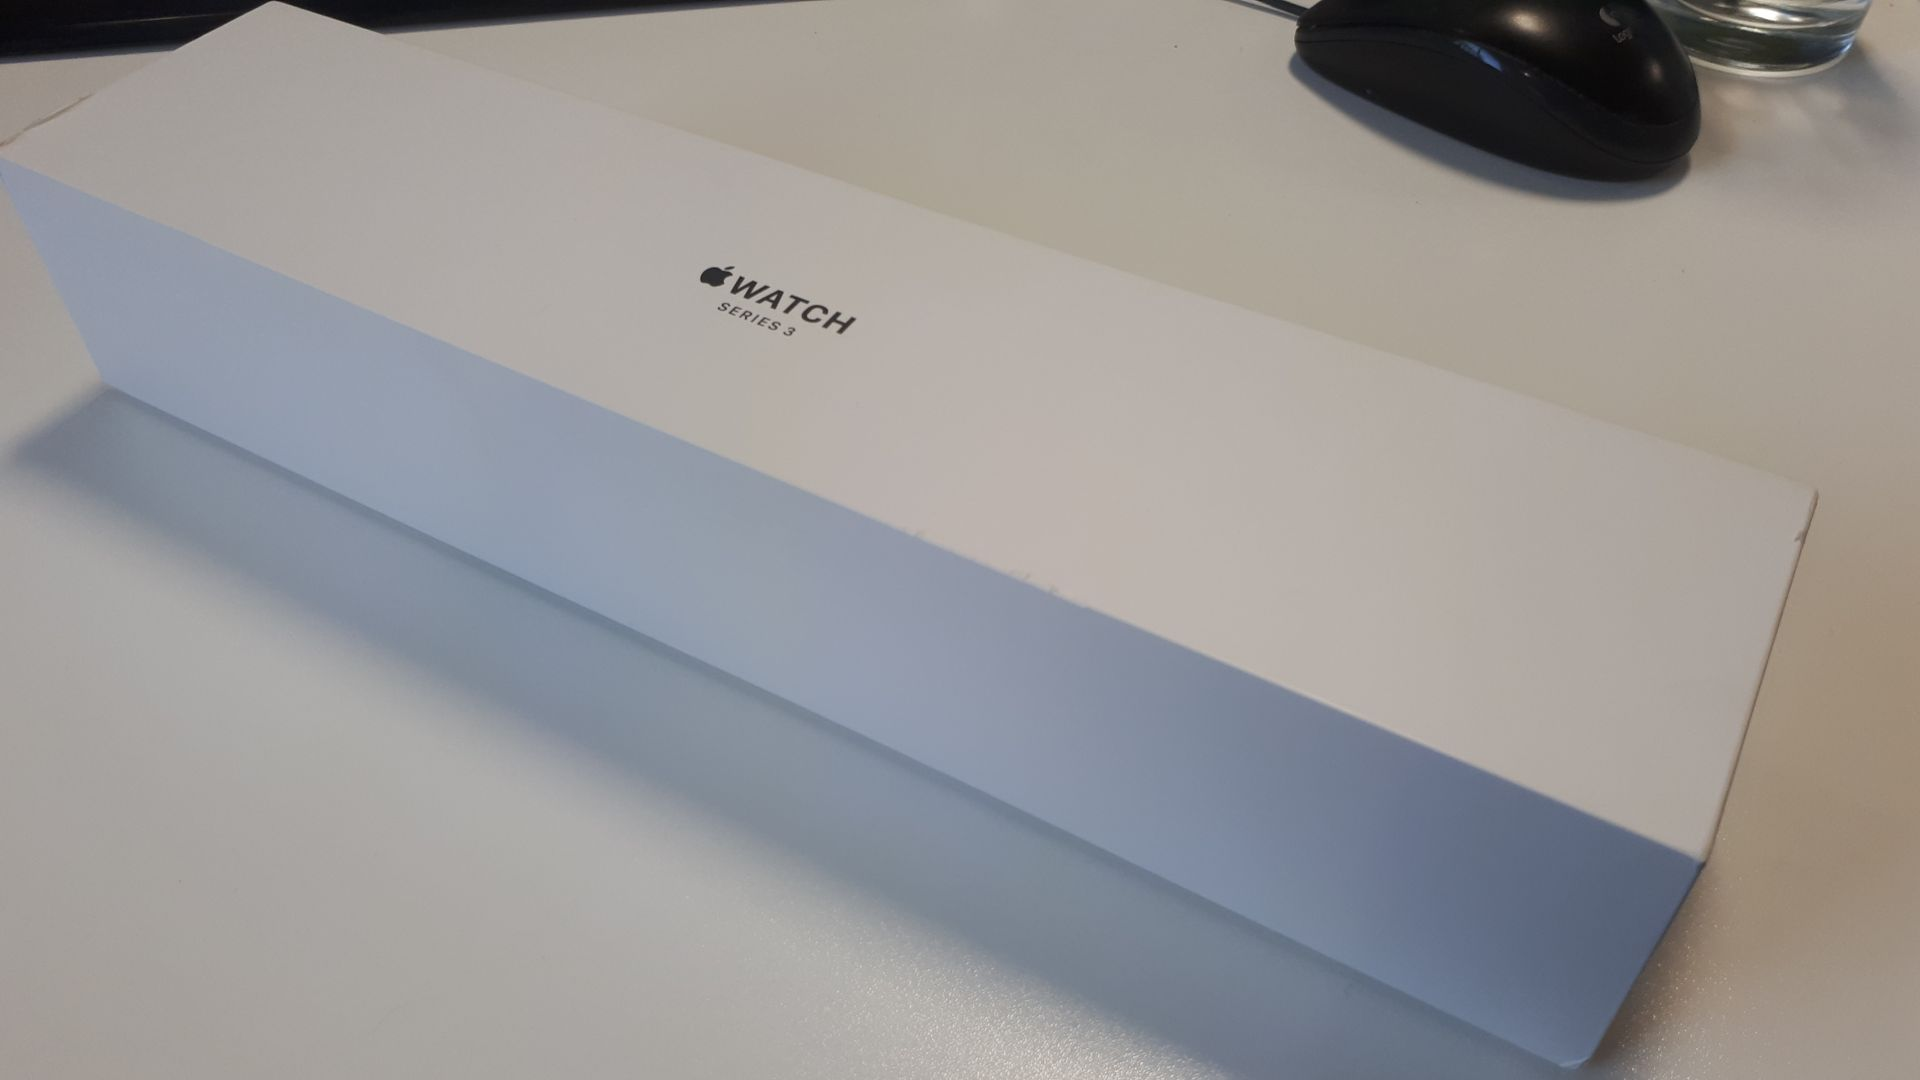 Unused, Boxed Apple Series 3 42mm Silver Aluminium - Image 2 of 4